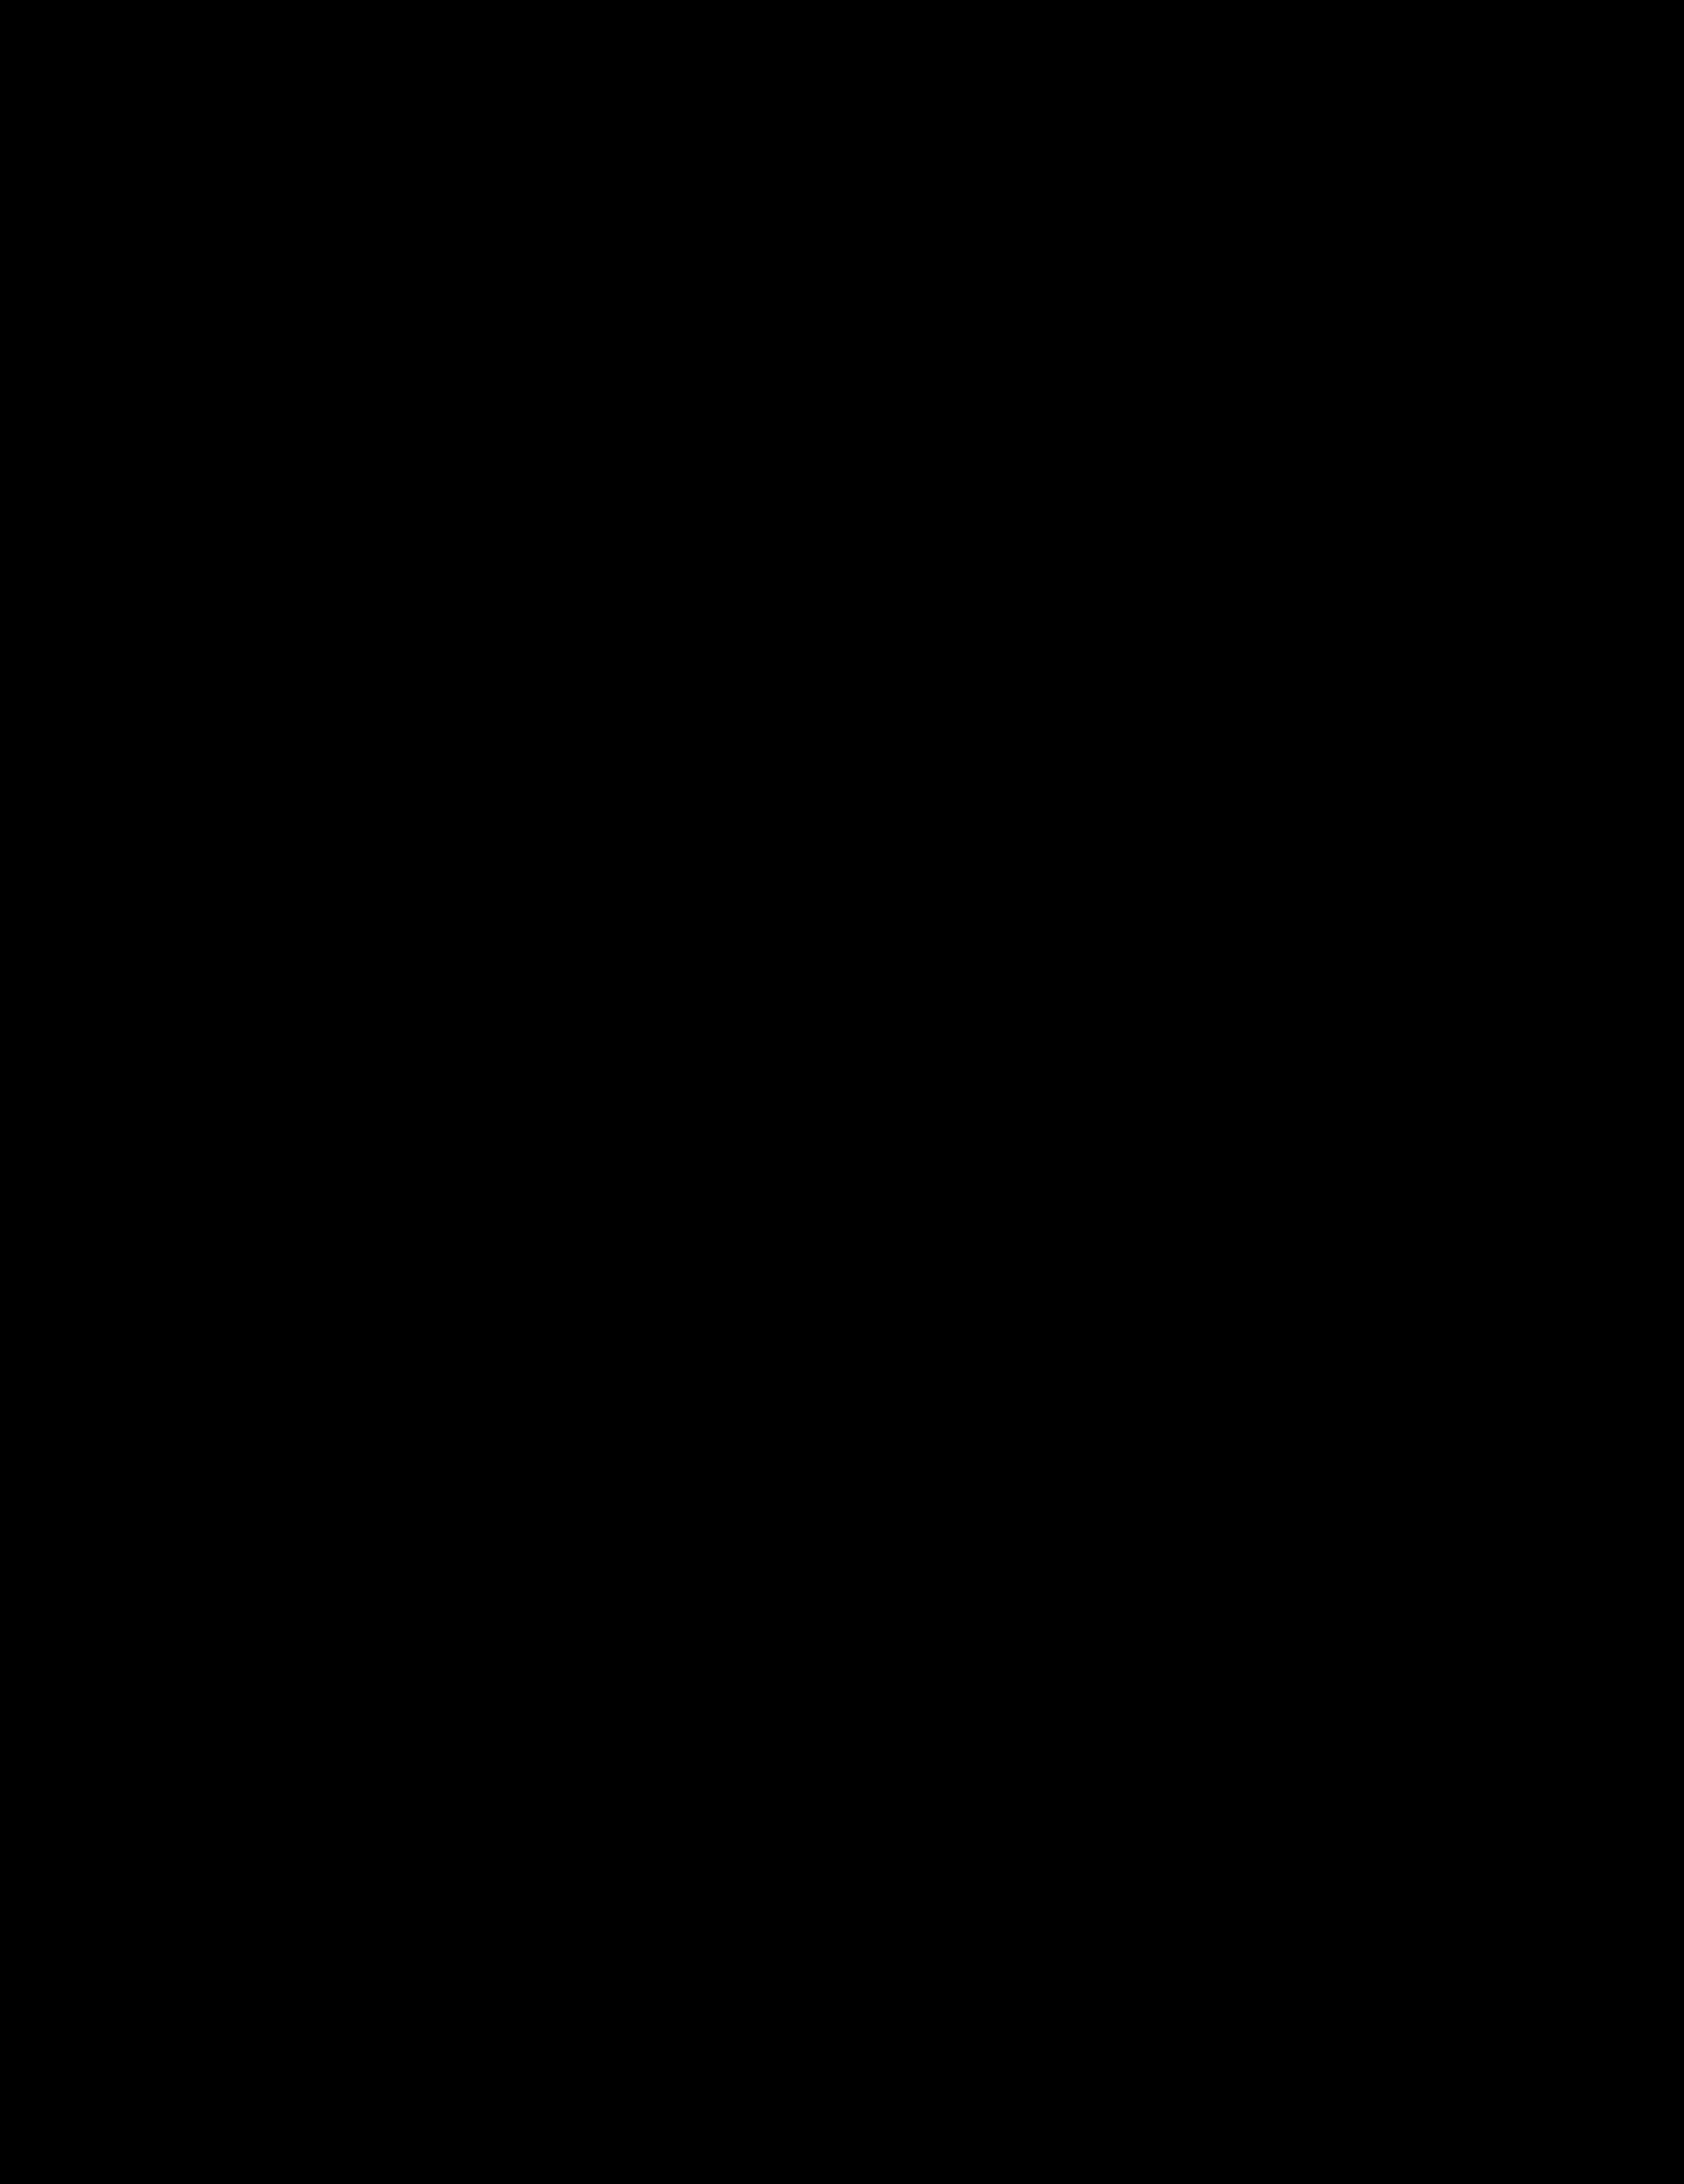 Zodiac Text Symbols Black : zodiac, symbols, black, Zodiac, Symbols, Firkin, Symbols,